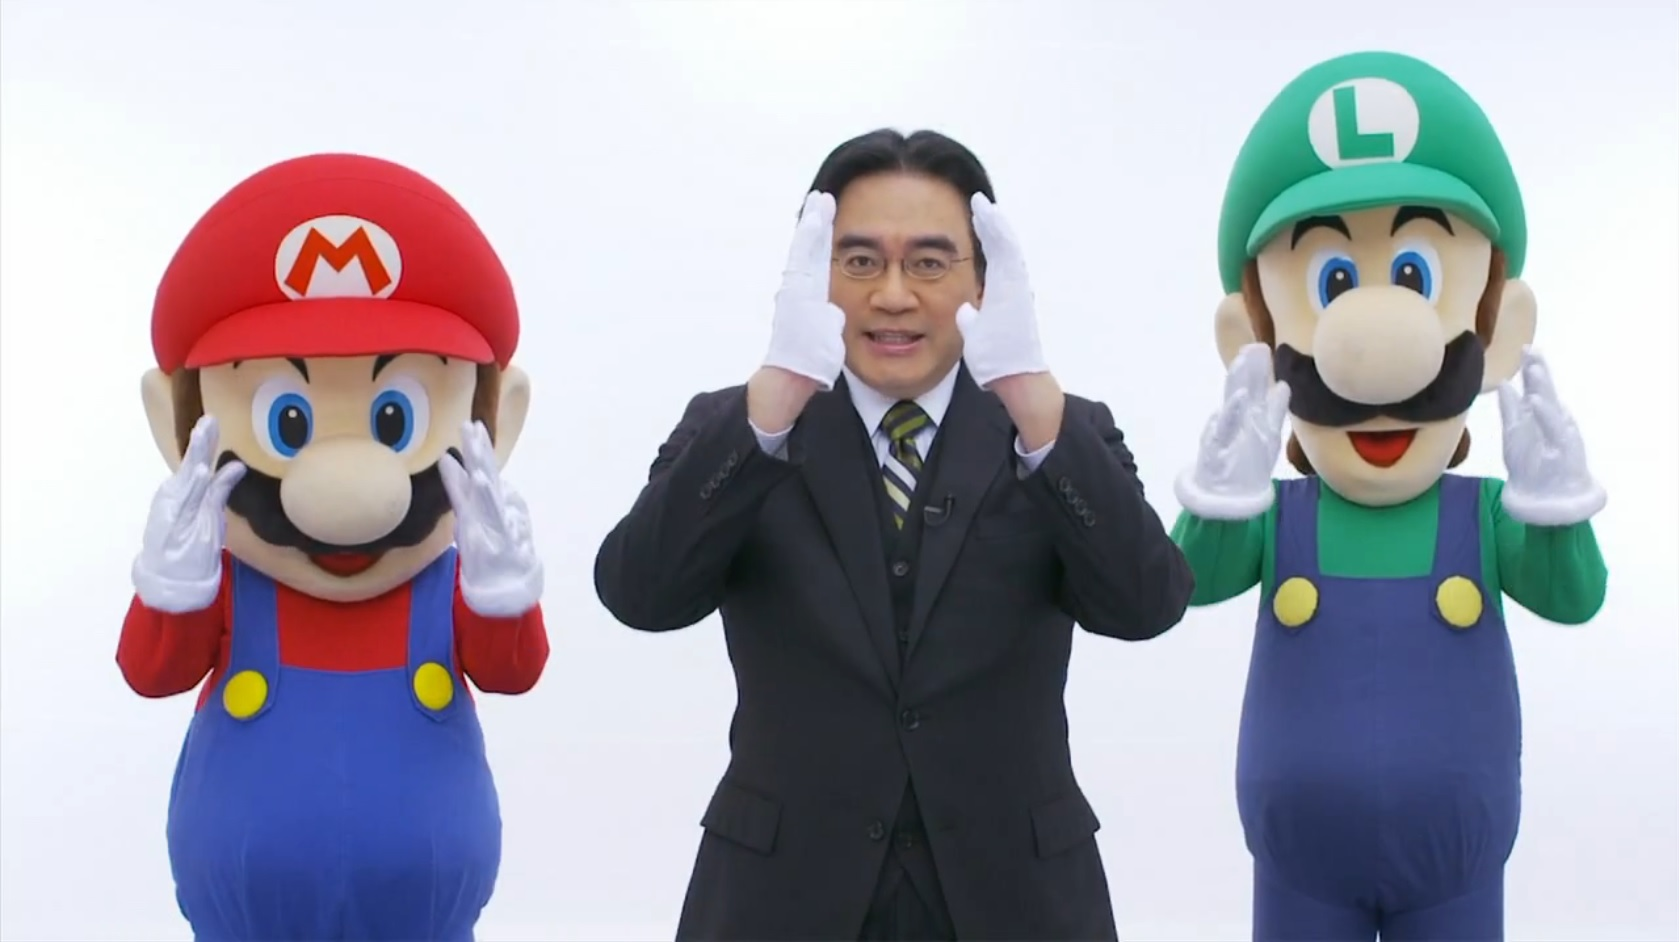 Nintendo president Satoru Iwata during one of his Nintendo Direct video events.